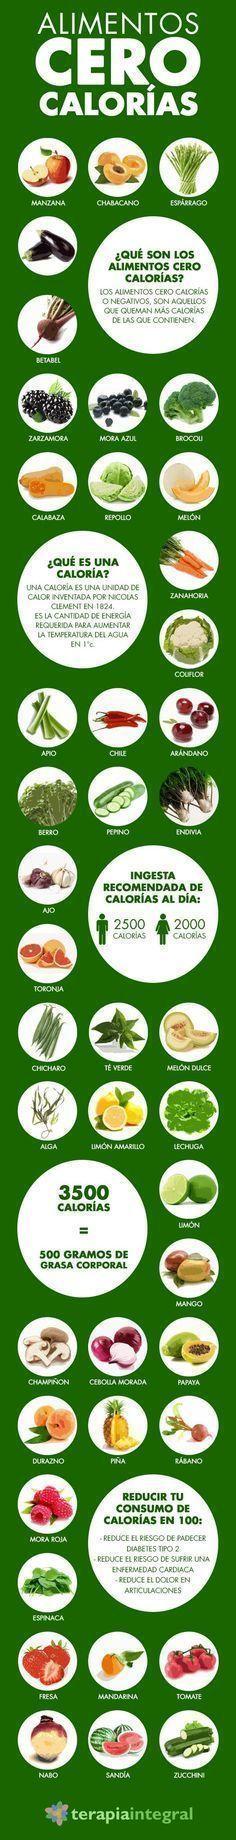 42 alimentos con cero calorías. #nutrición #salud #infografía #nutricioninfografia